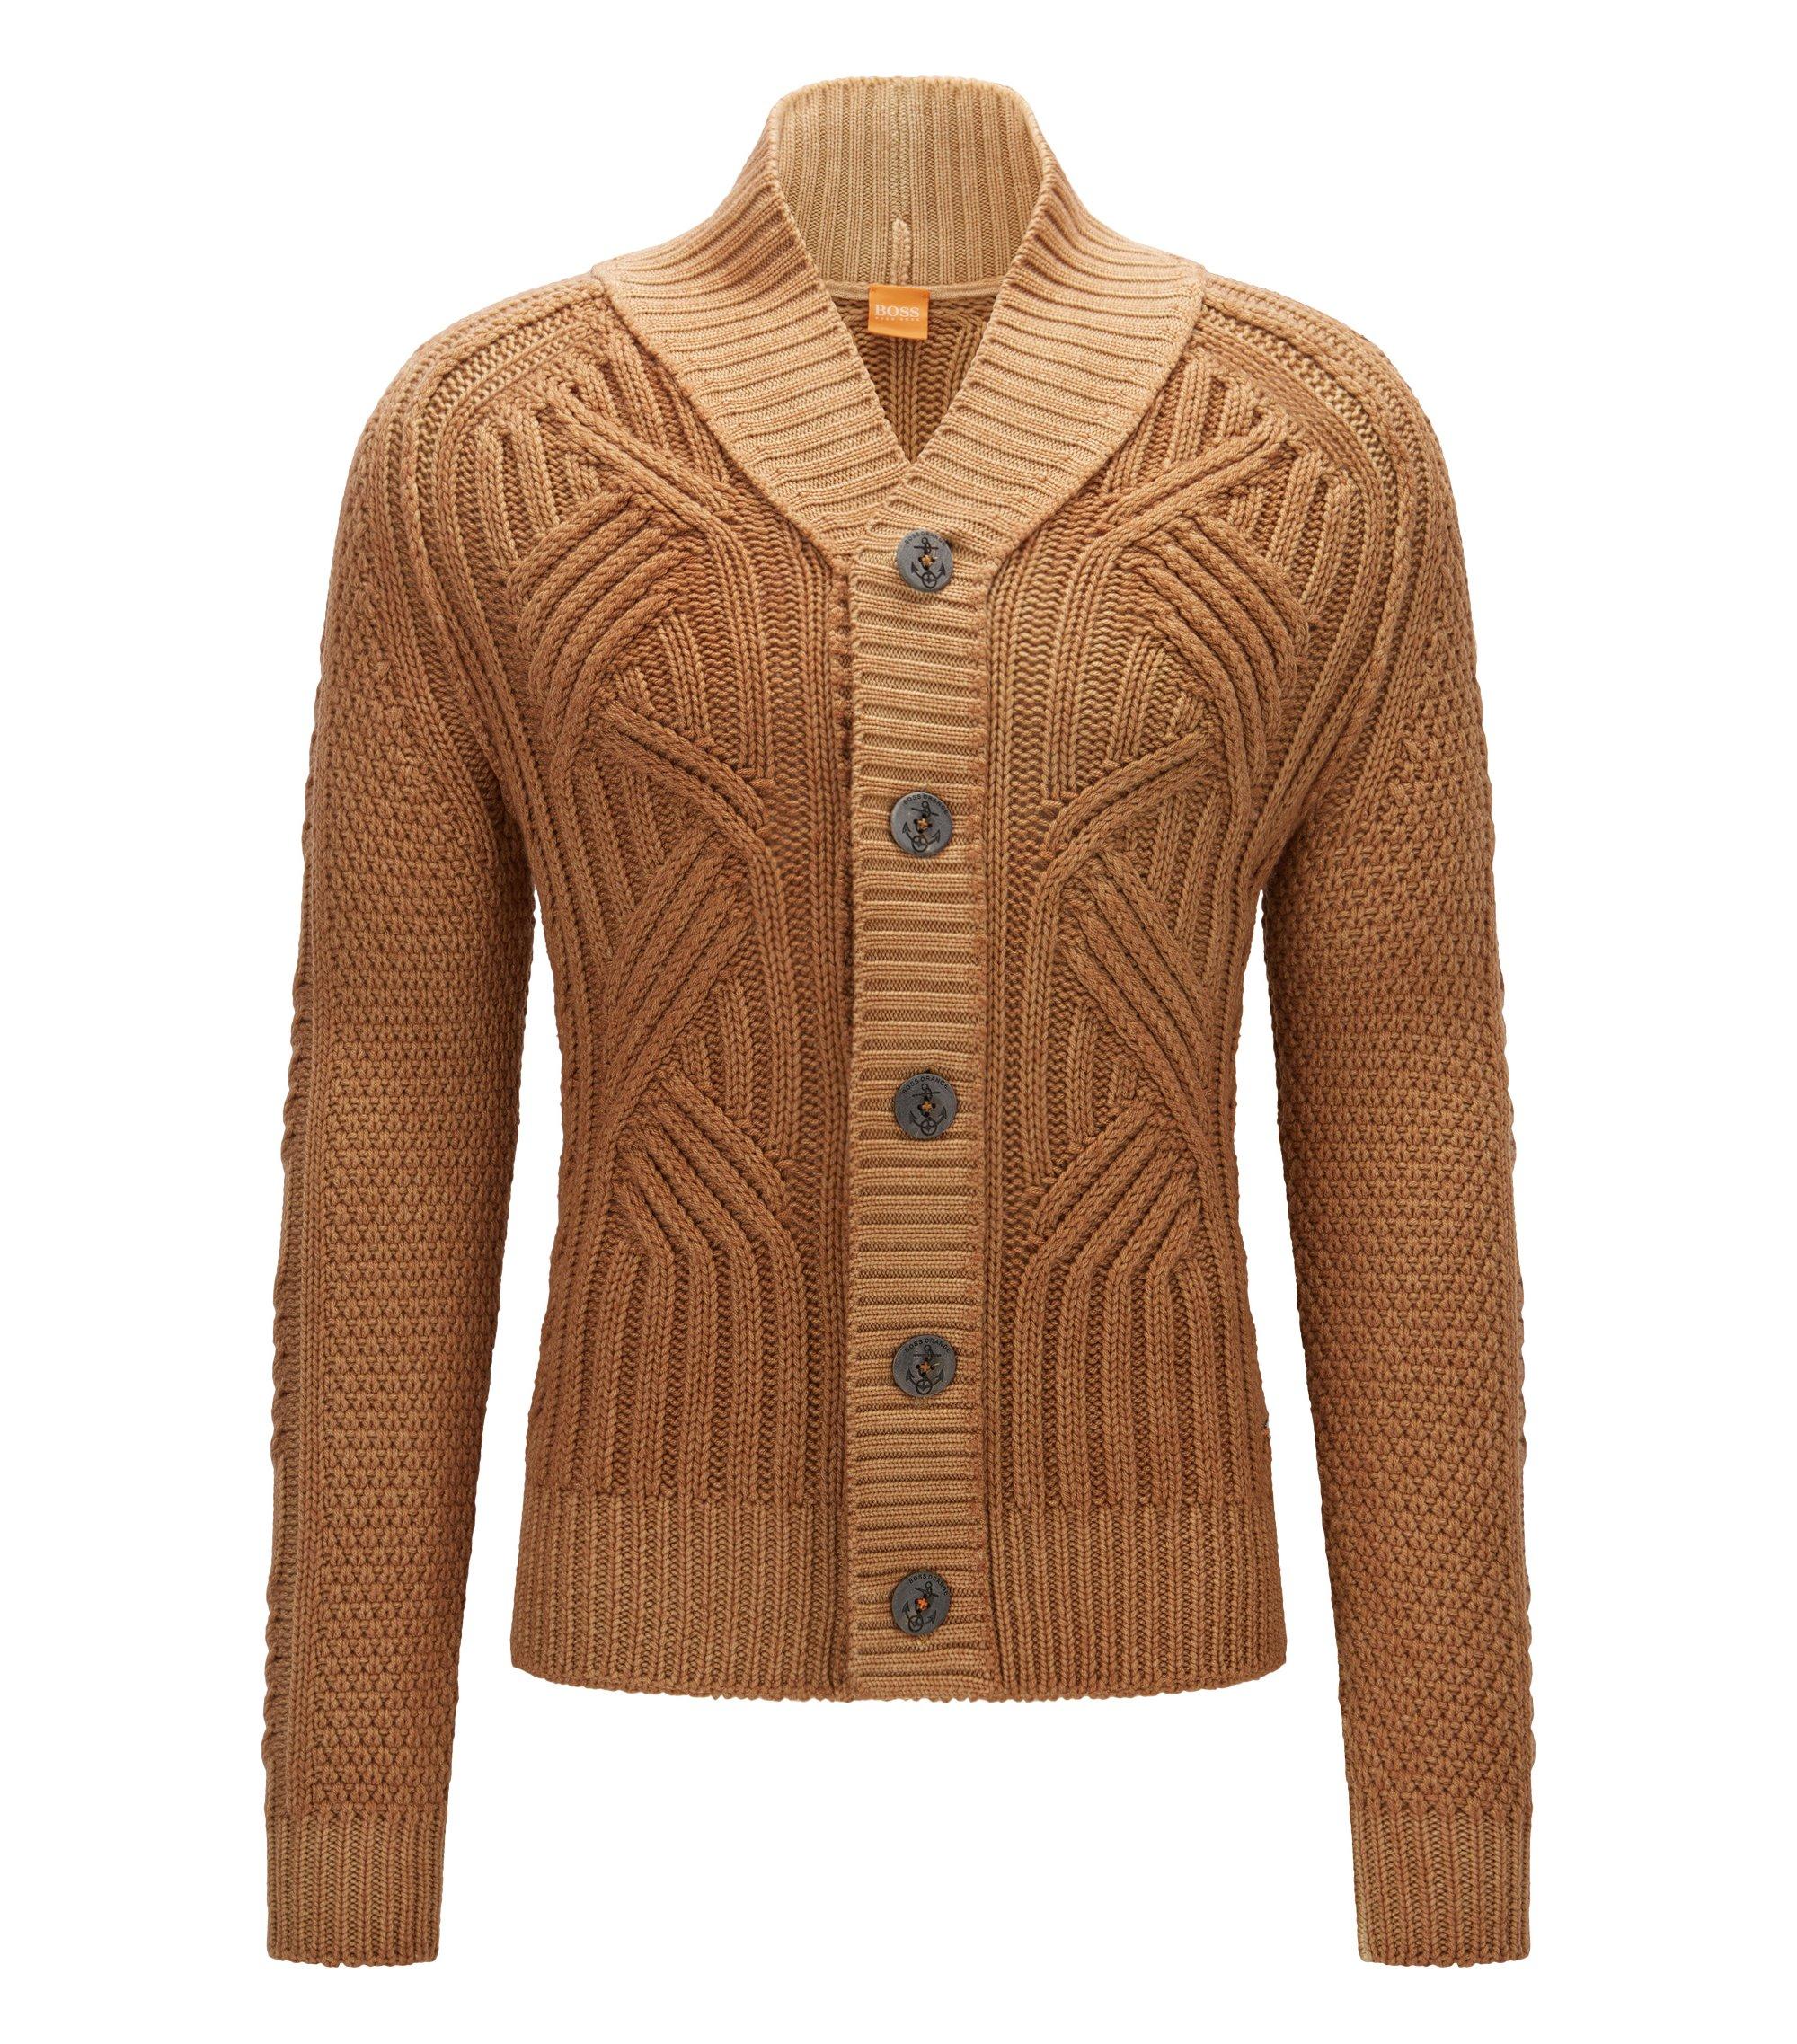 Cable Knit Virgin Wool Cardigan | Kalamos, Beige